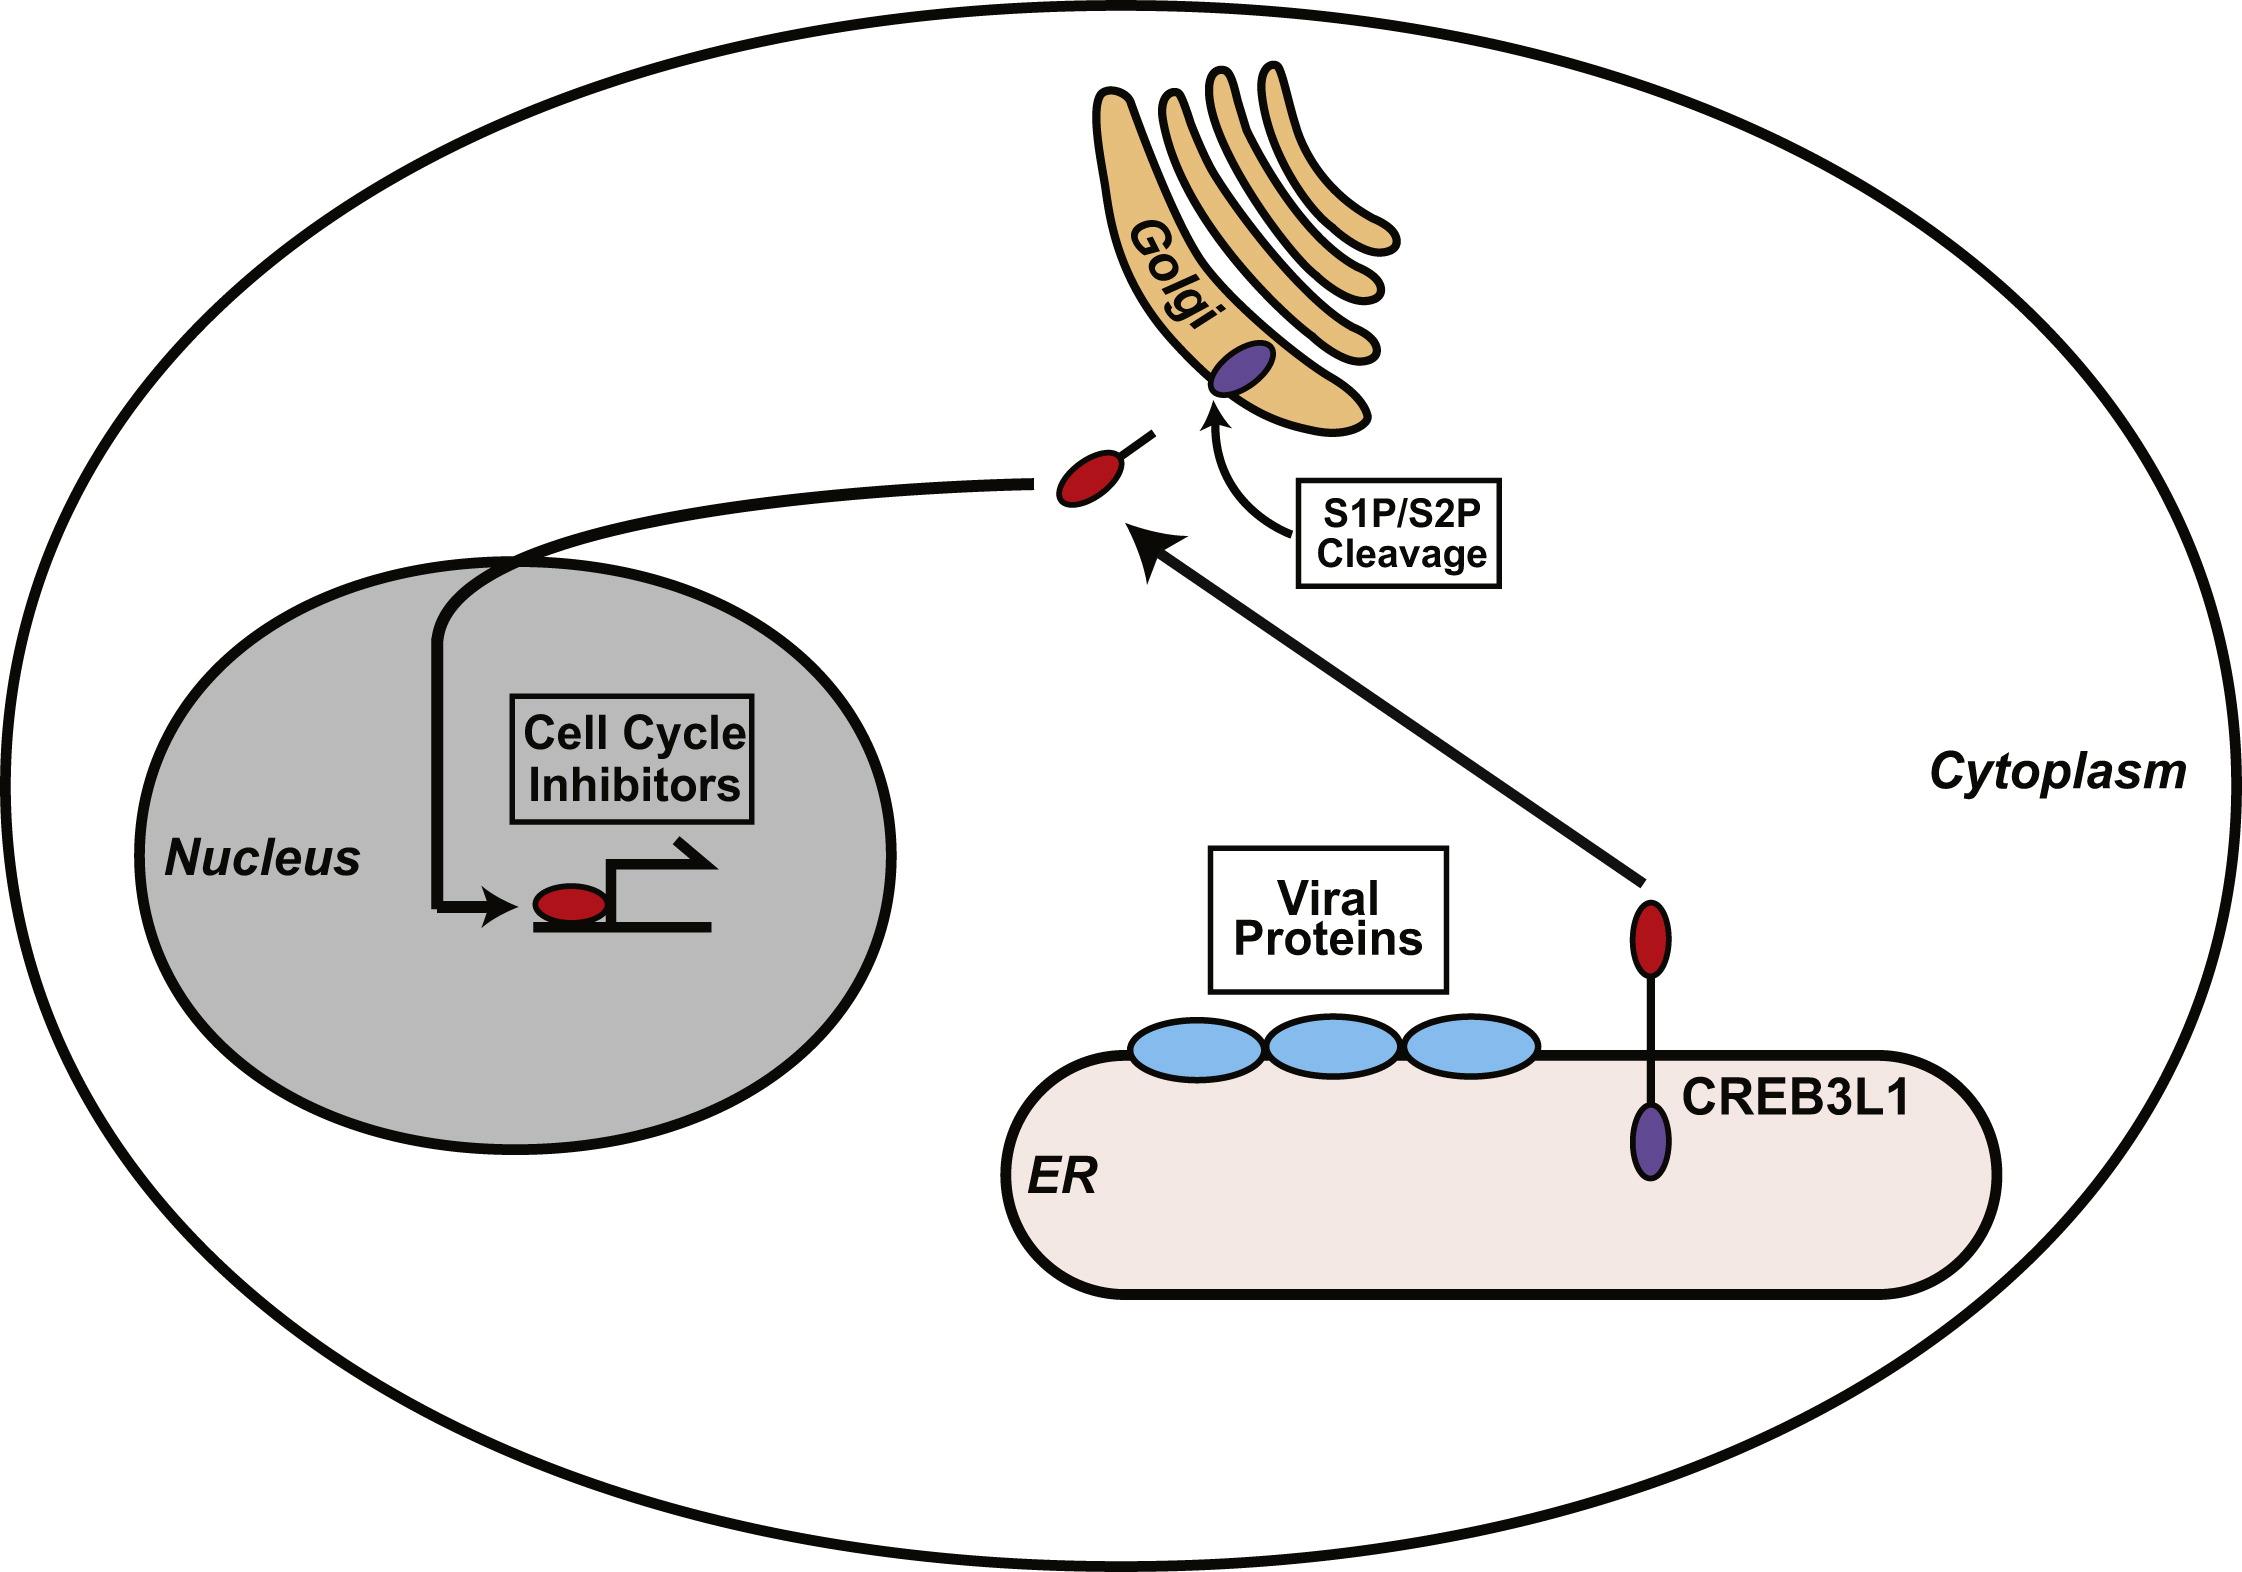 The Membrane Bound Transcription Factor Creb3l1 Is